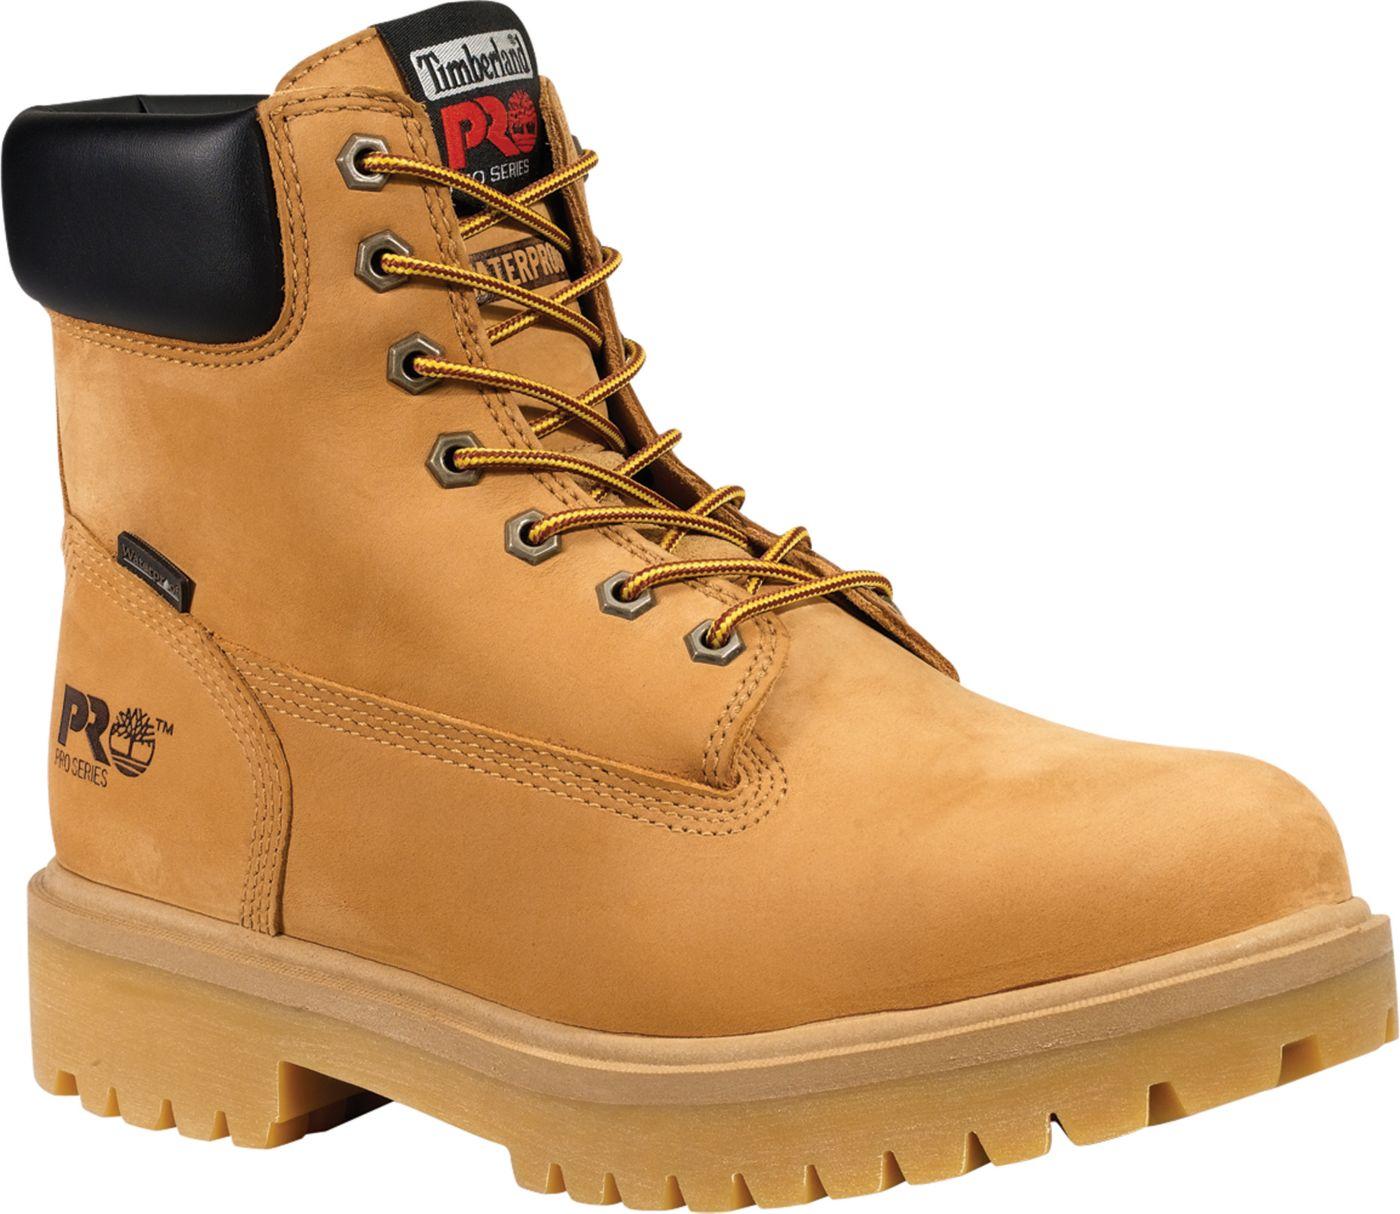 "Timberland PRO Men's Direct Attach 6"" 200g Waterproof Steel Toe Work Boots"